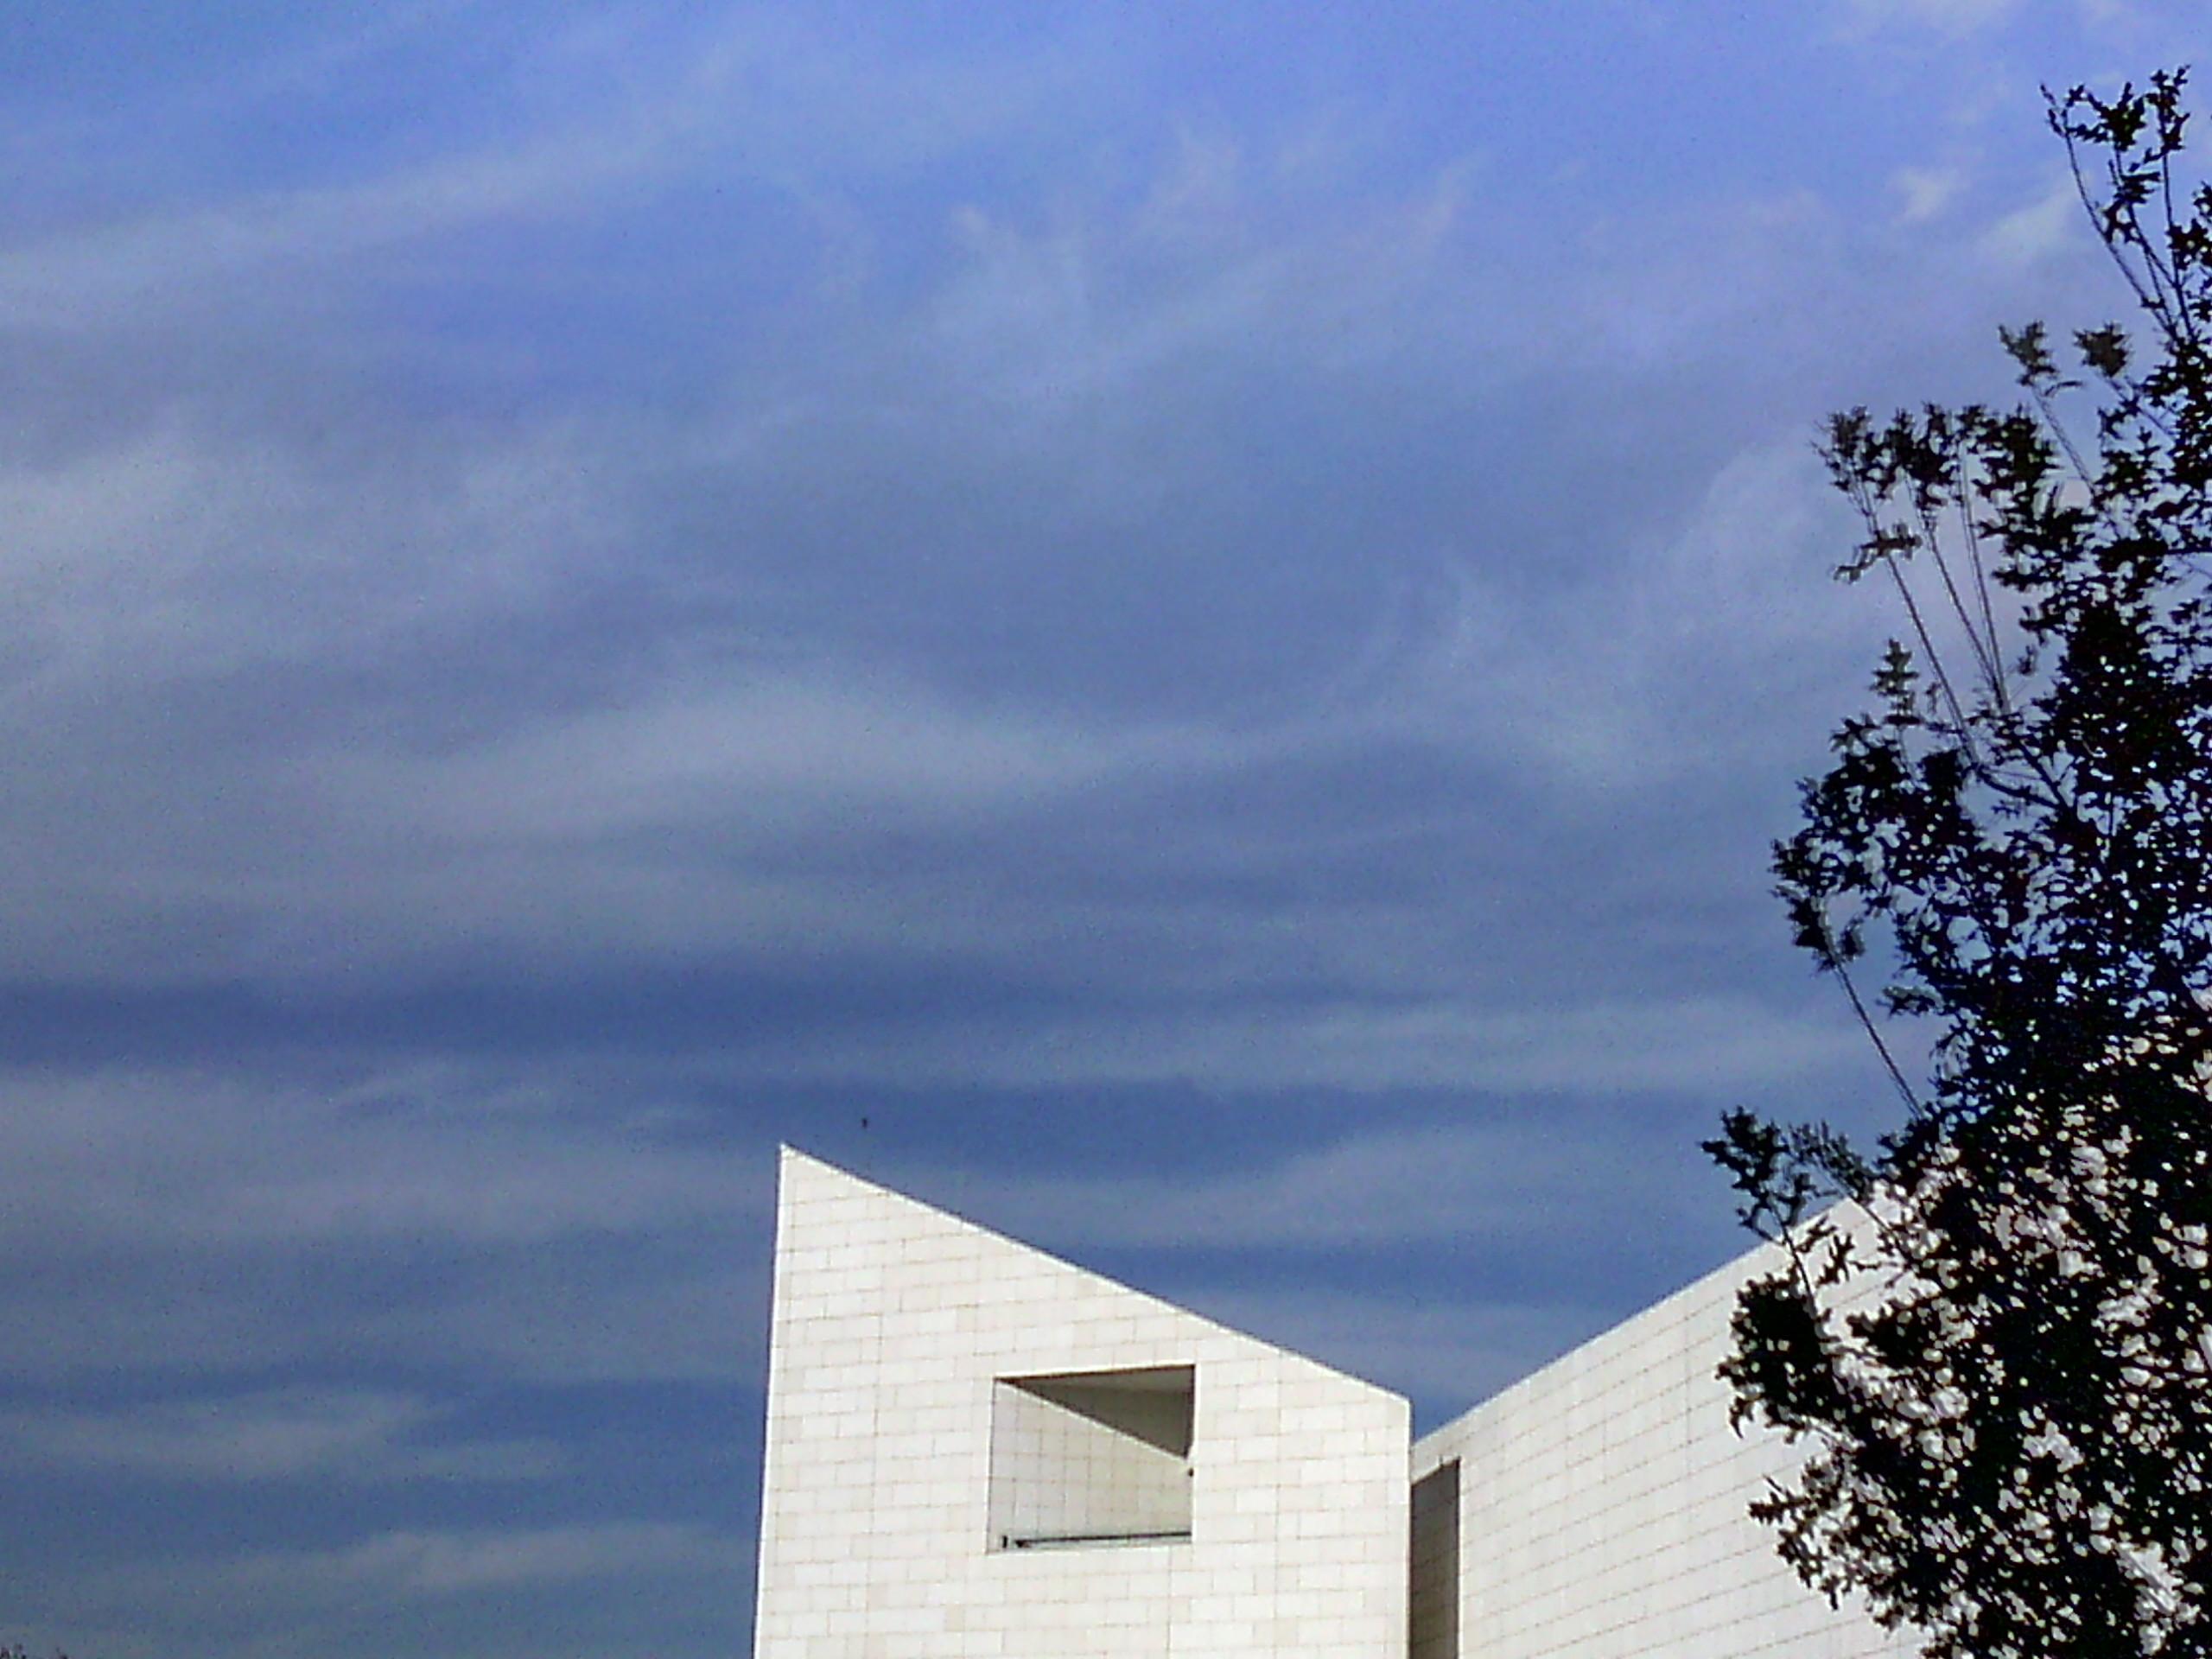 White building, Architecture, Blue, Building, Corners, HQ Photo